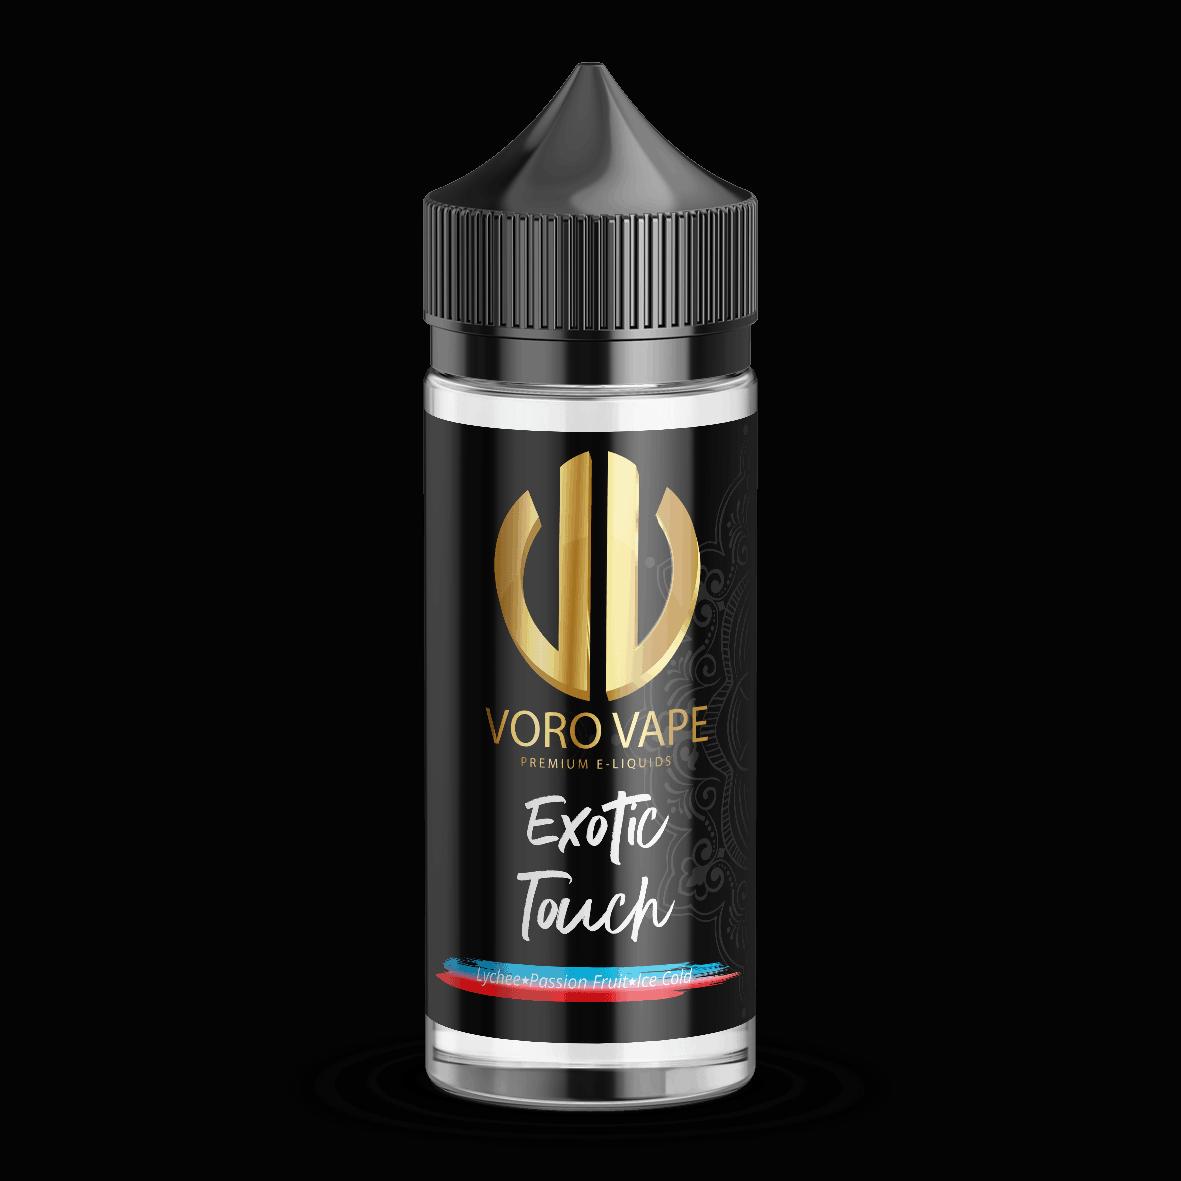 Voro Vape 100ml Exotic Touch 525x525 - Exotic Touch E-Liquid Shortfill by Voro Vape